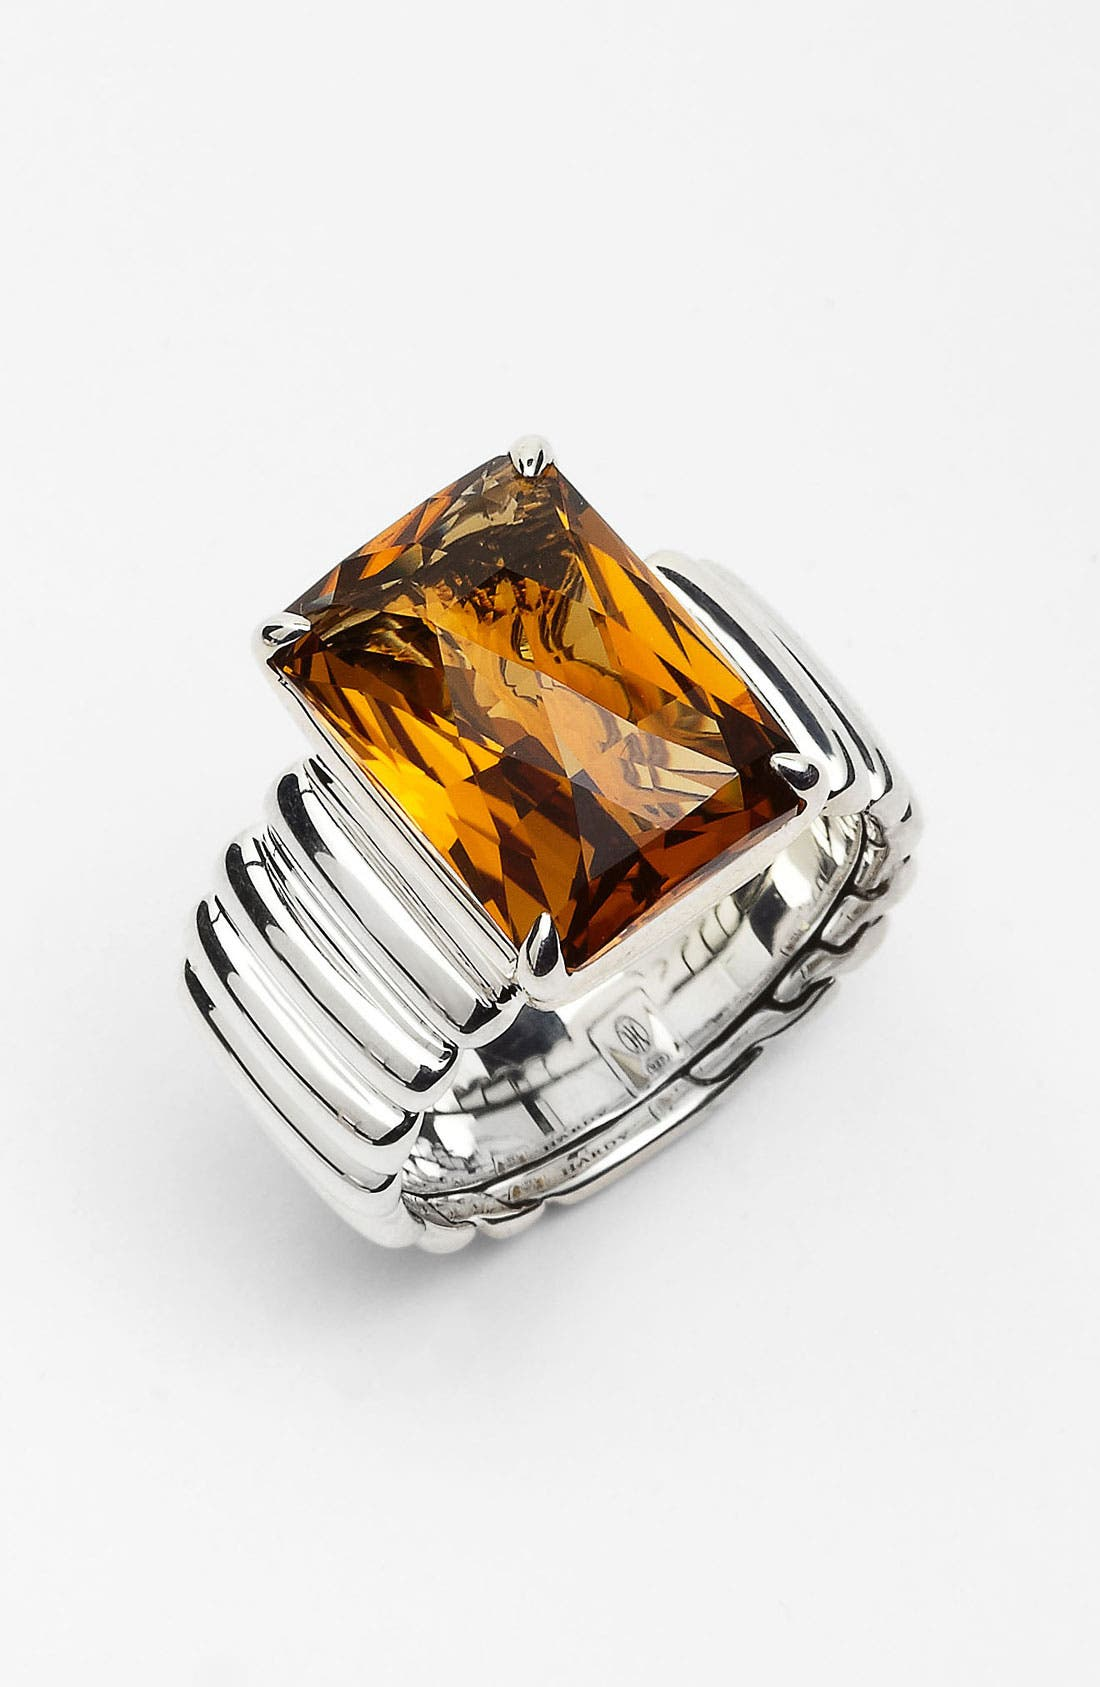 Main Image - John Hardy 'Bedeg' Wide Ring